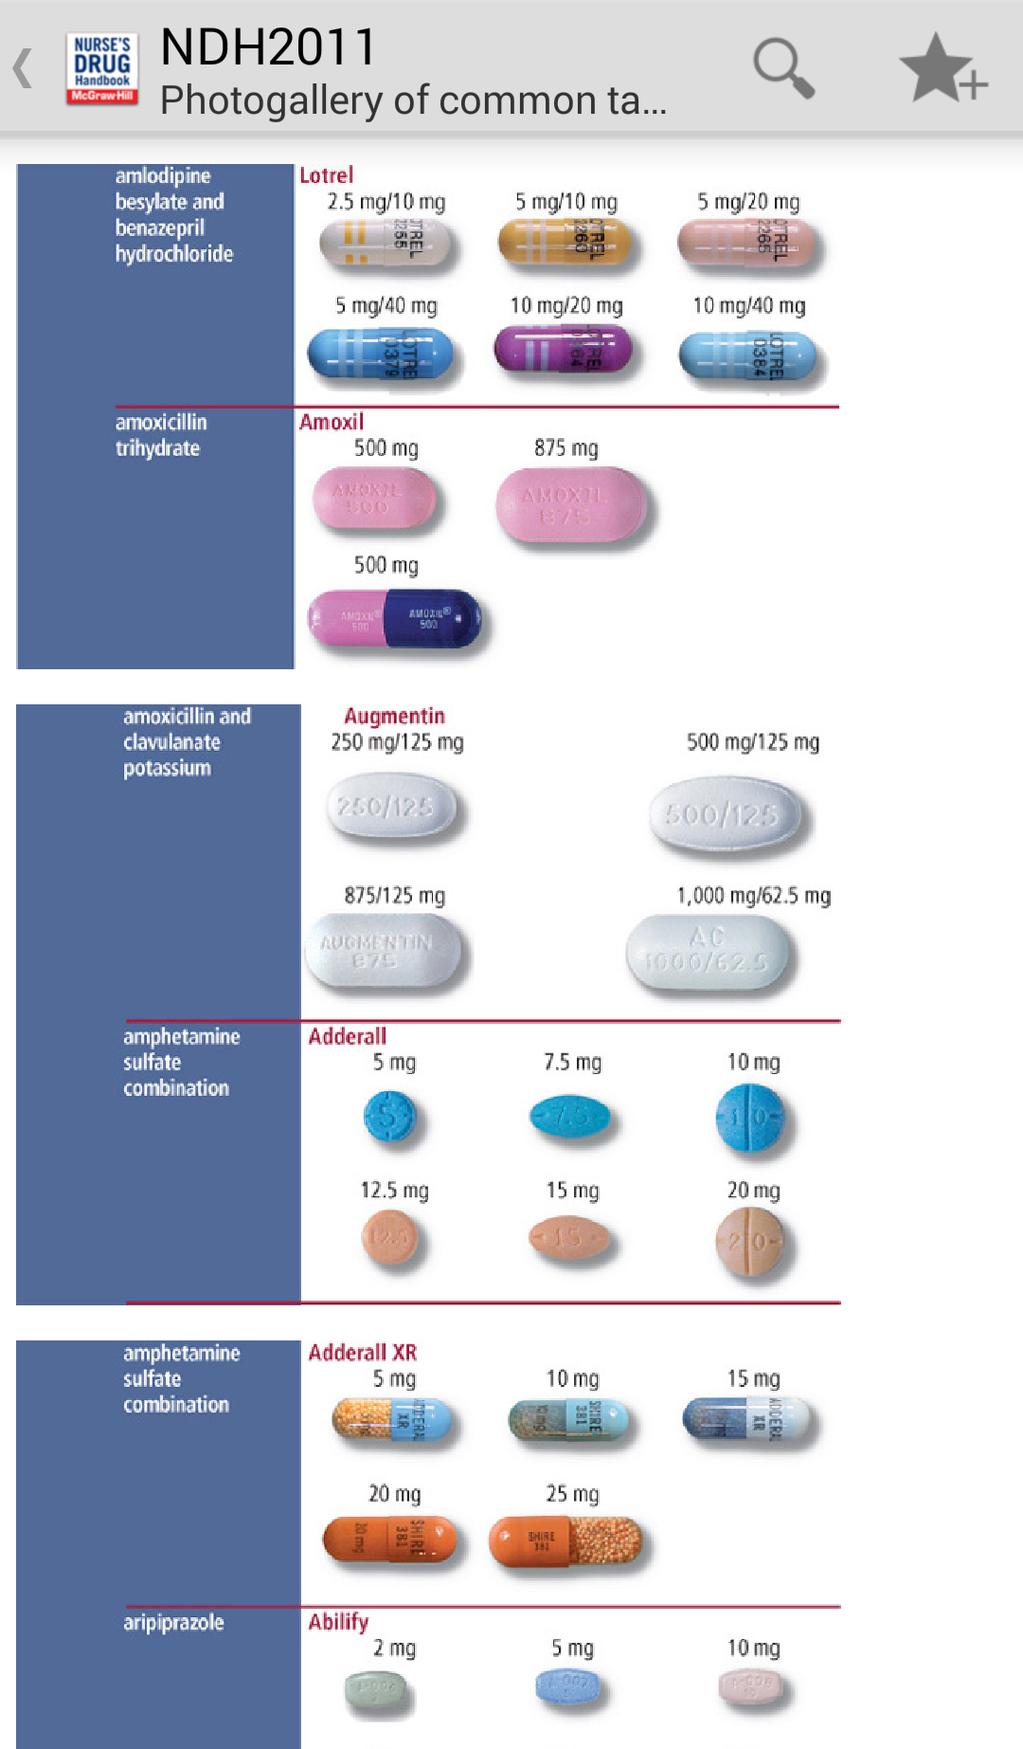 Nurse's Drug Handbook Screenshot 4